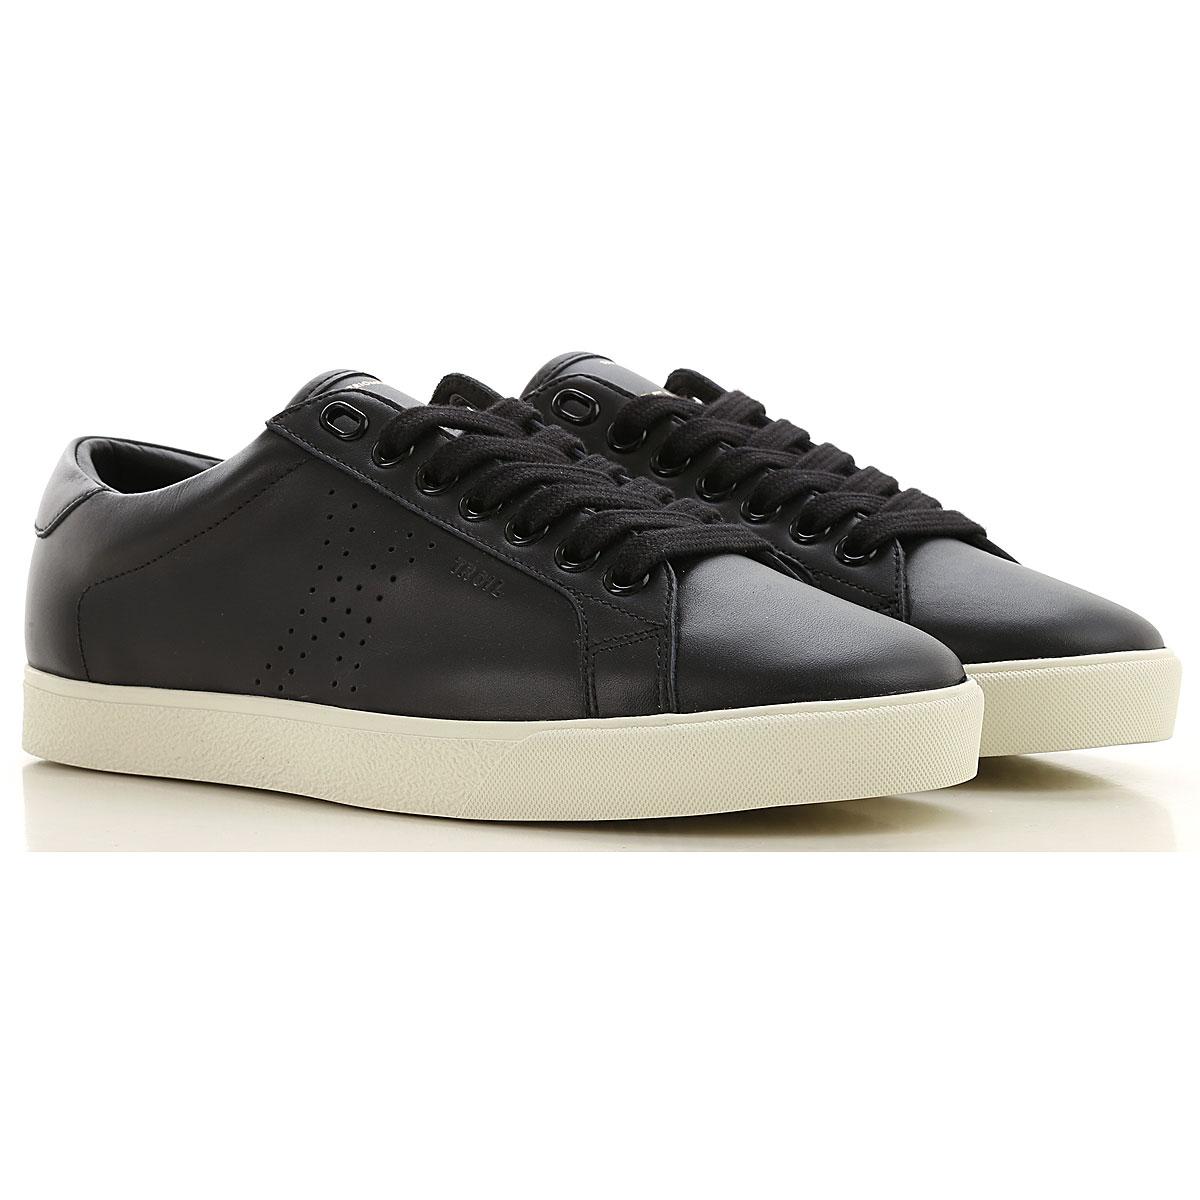 Celine Sneakers for Women On Sale, Black, Leather, 2019, 6 7 8 9